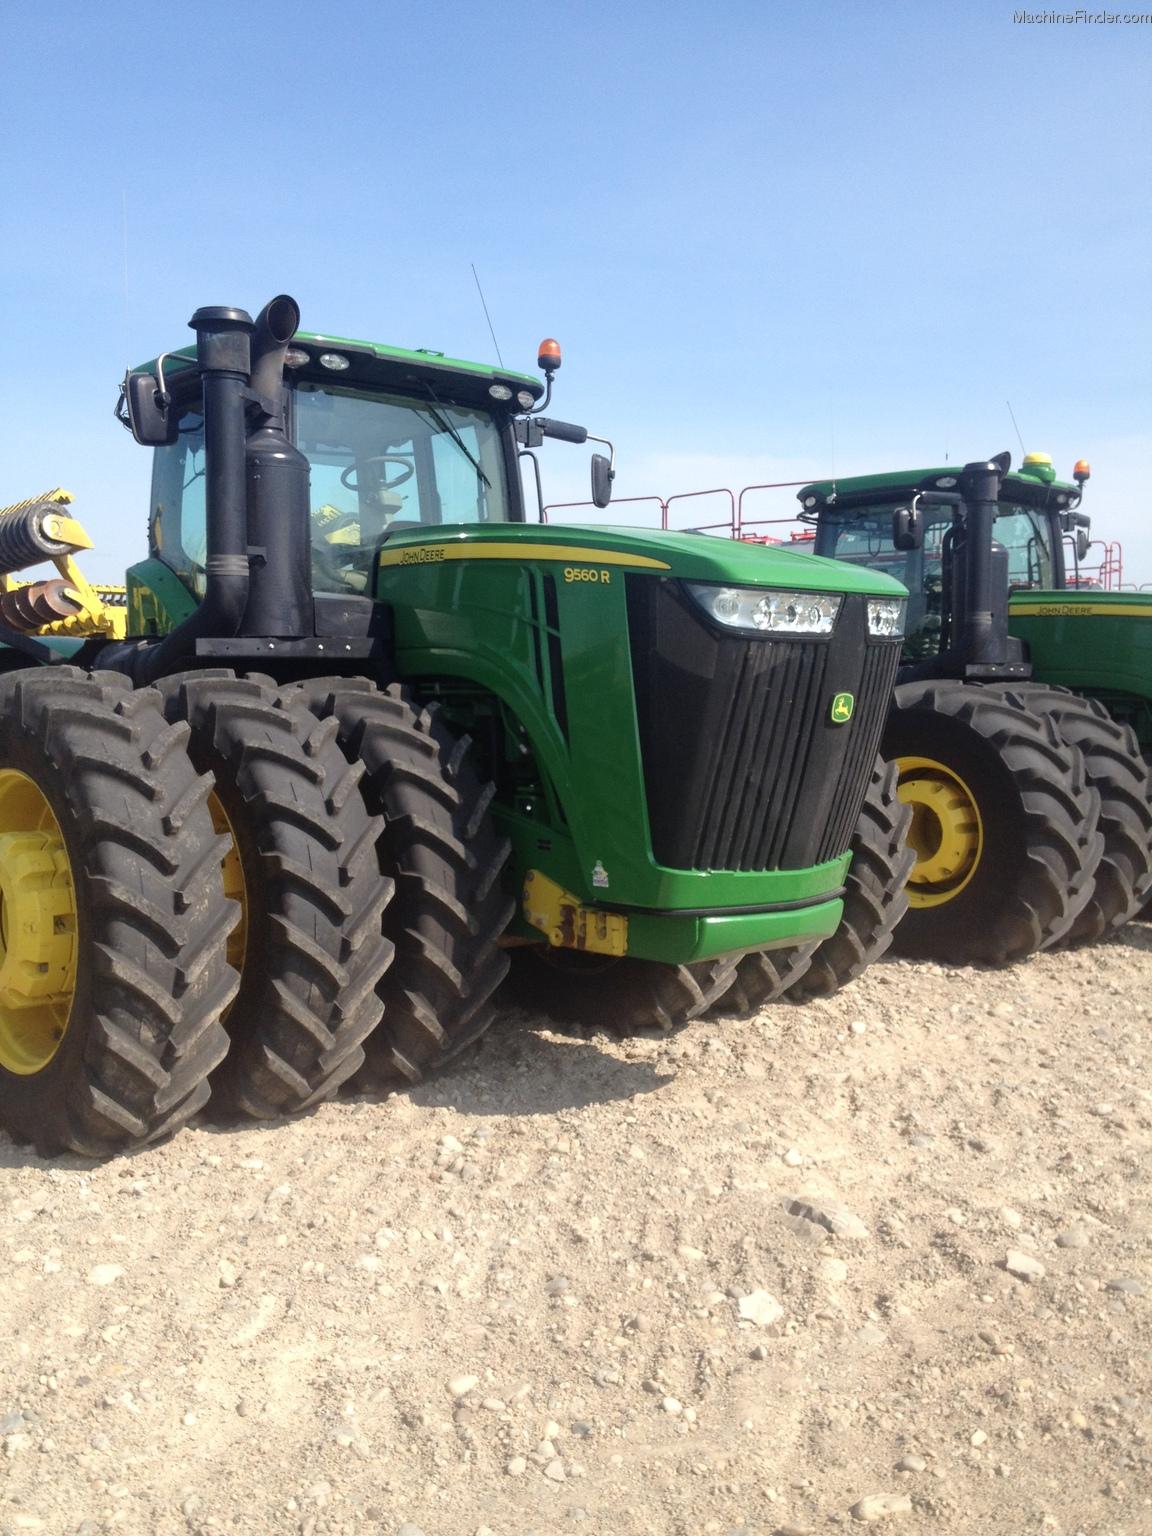 2014 John Deere 9560R Tractors - Articulated 4WD - John ...